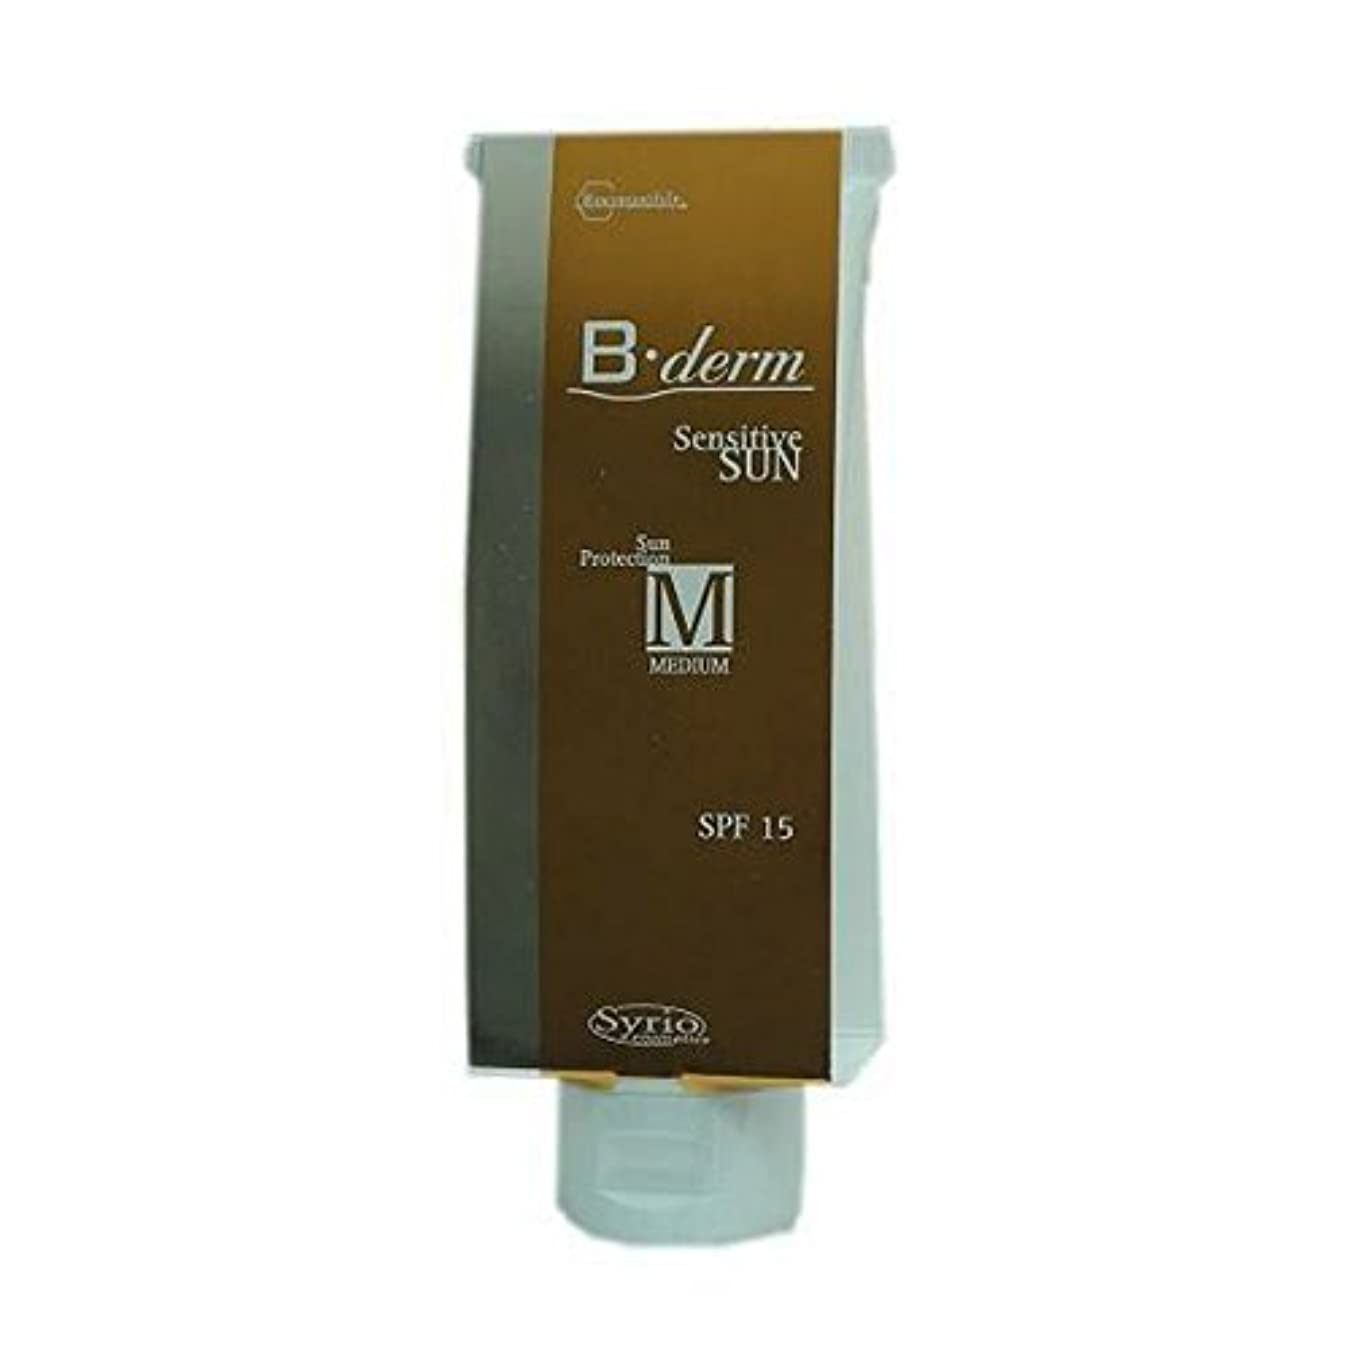 誘う抽選役割B-derm Sun Cream Spf15 125ml [並行輸入品]